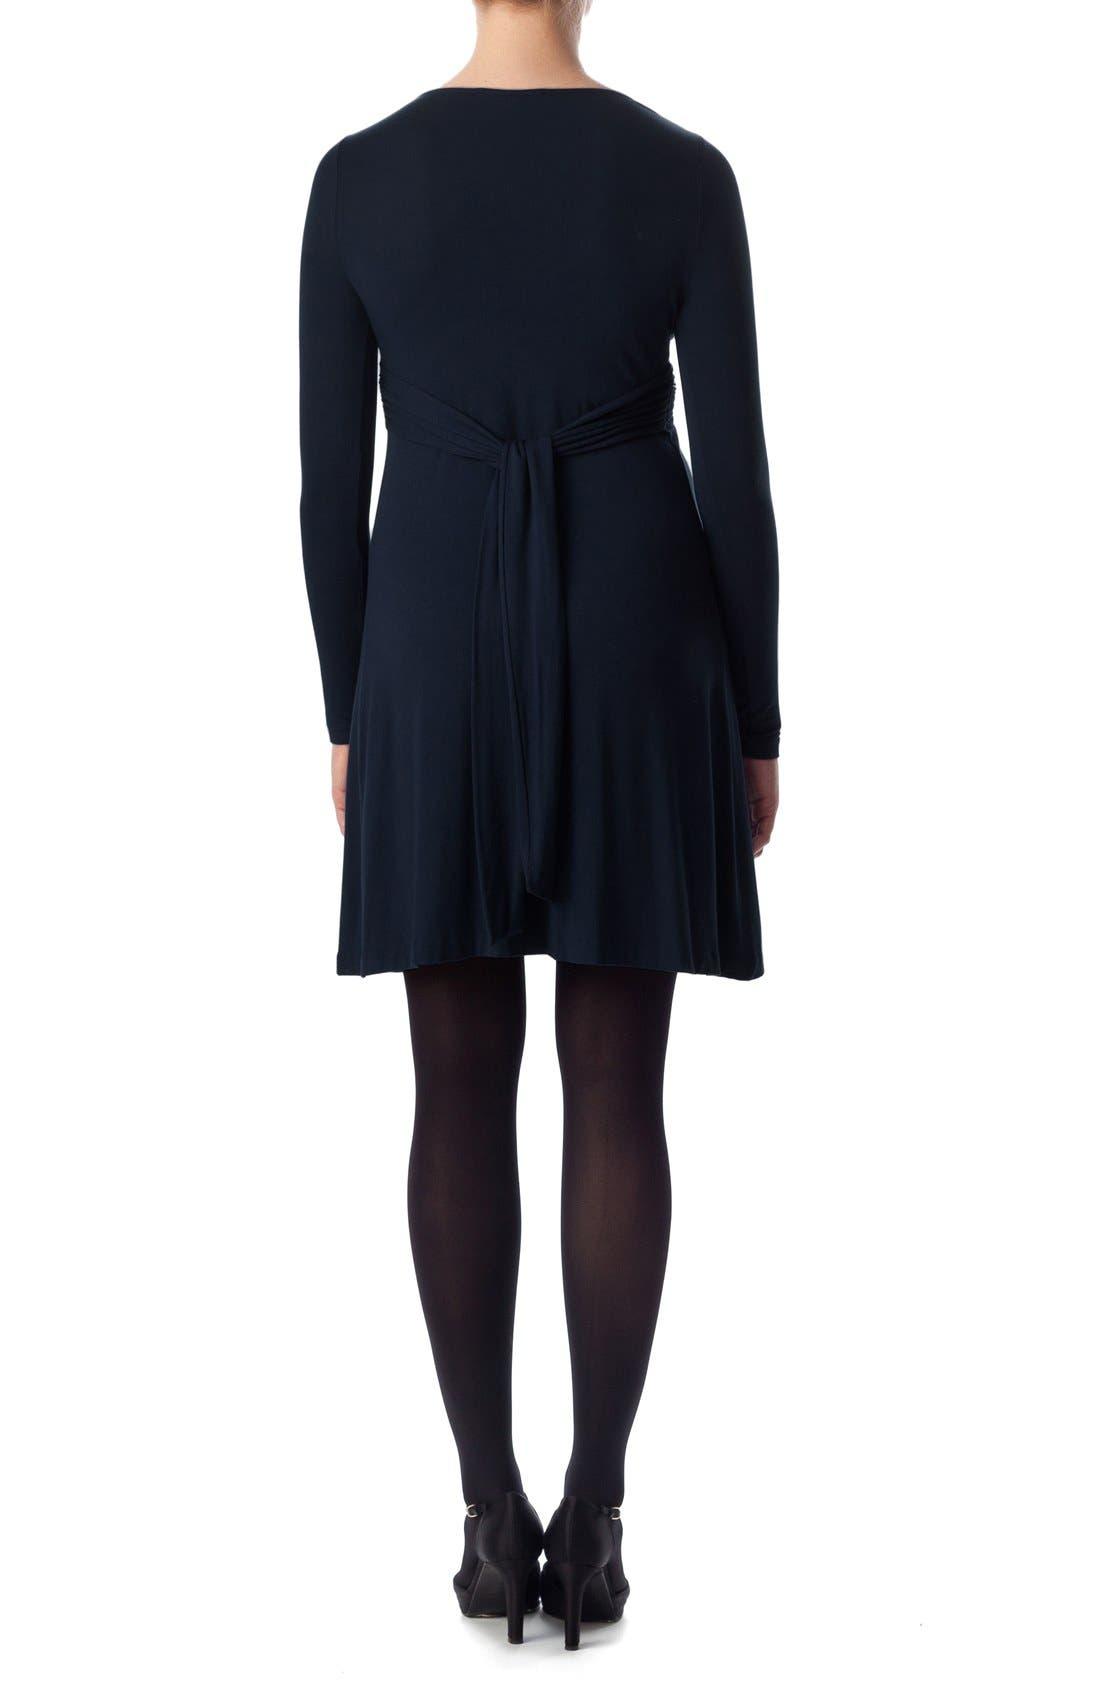 'Madonna' Twist Detail Jersey Maternity Dress,                             Alternate thumbnail 2, color,                             Dress Blues